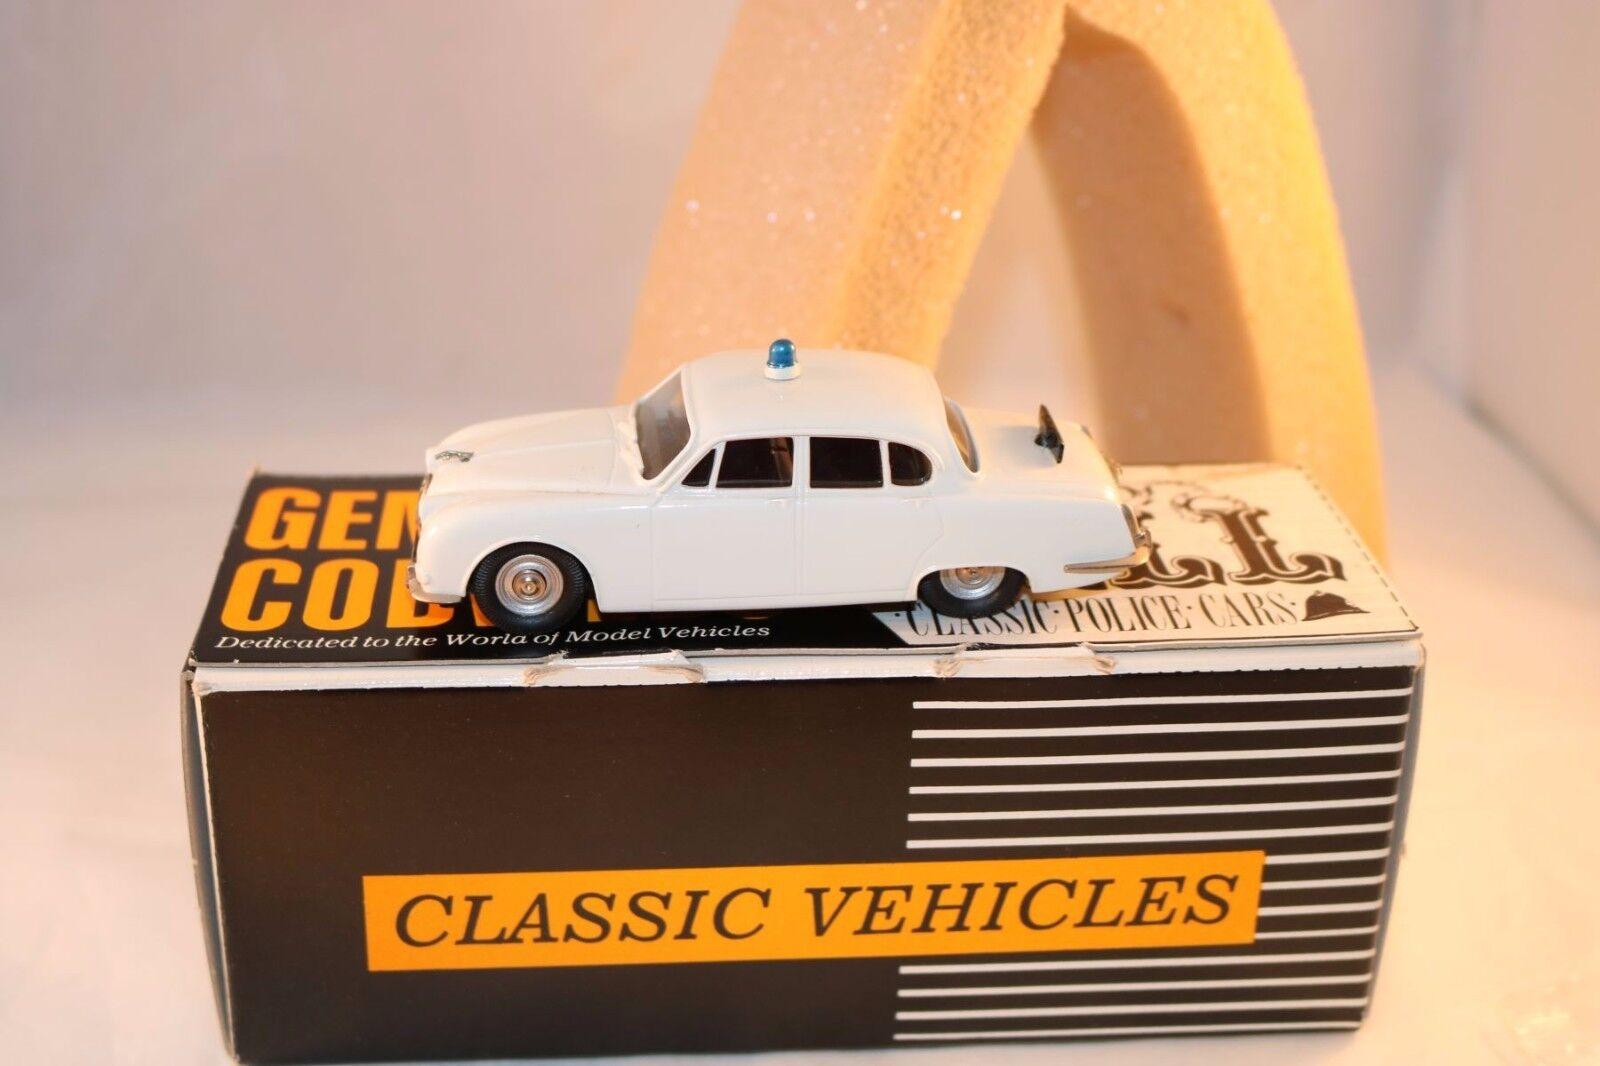 Gembs & spinnweben jaguar s type 1967 metropolitan verkehrswagen perfekt minze im kasten